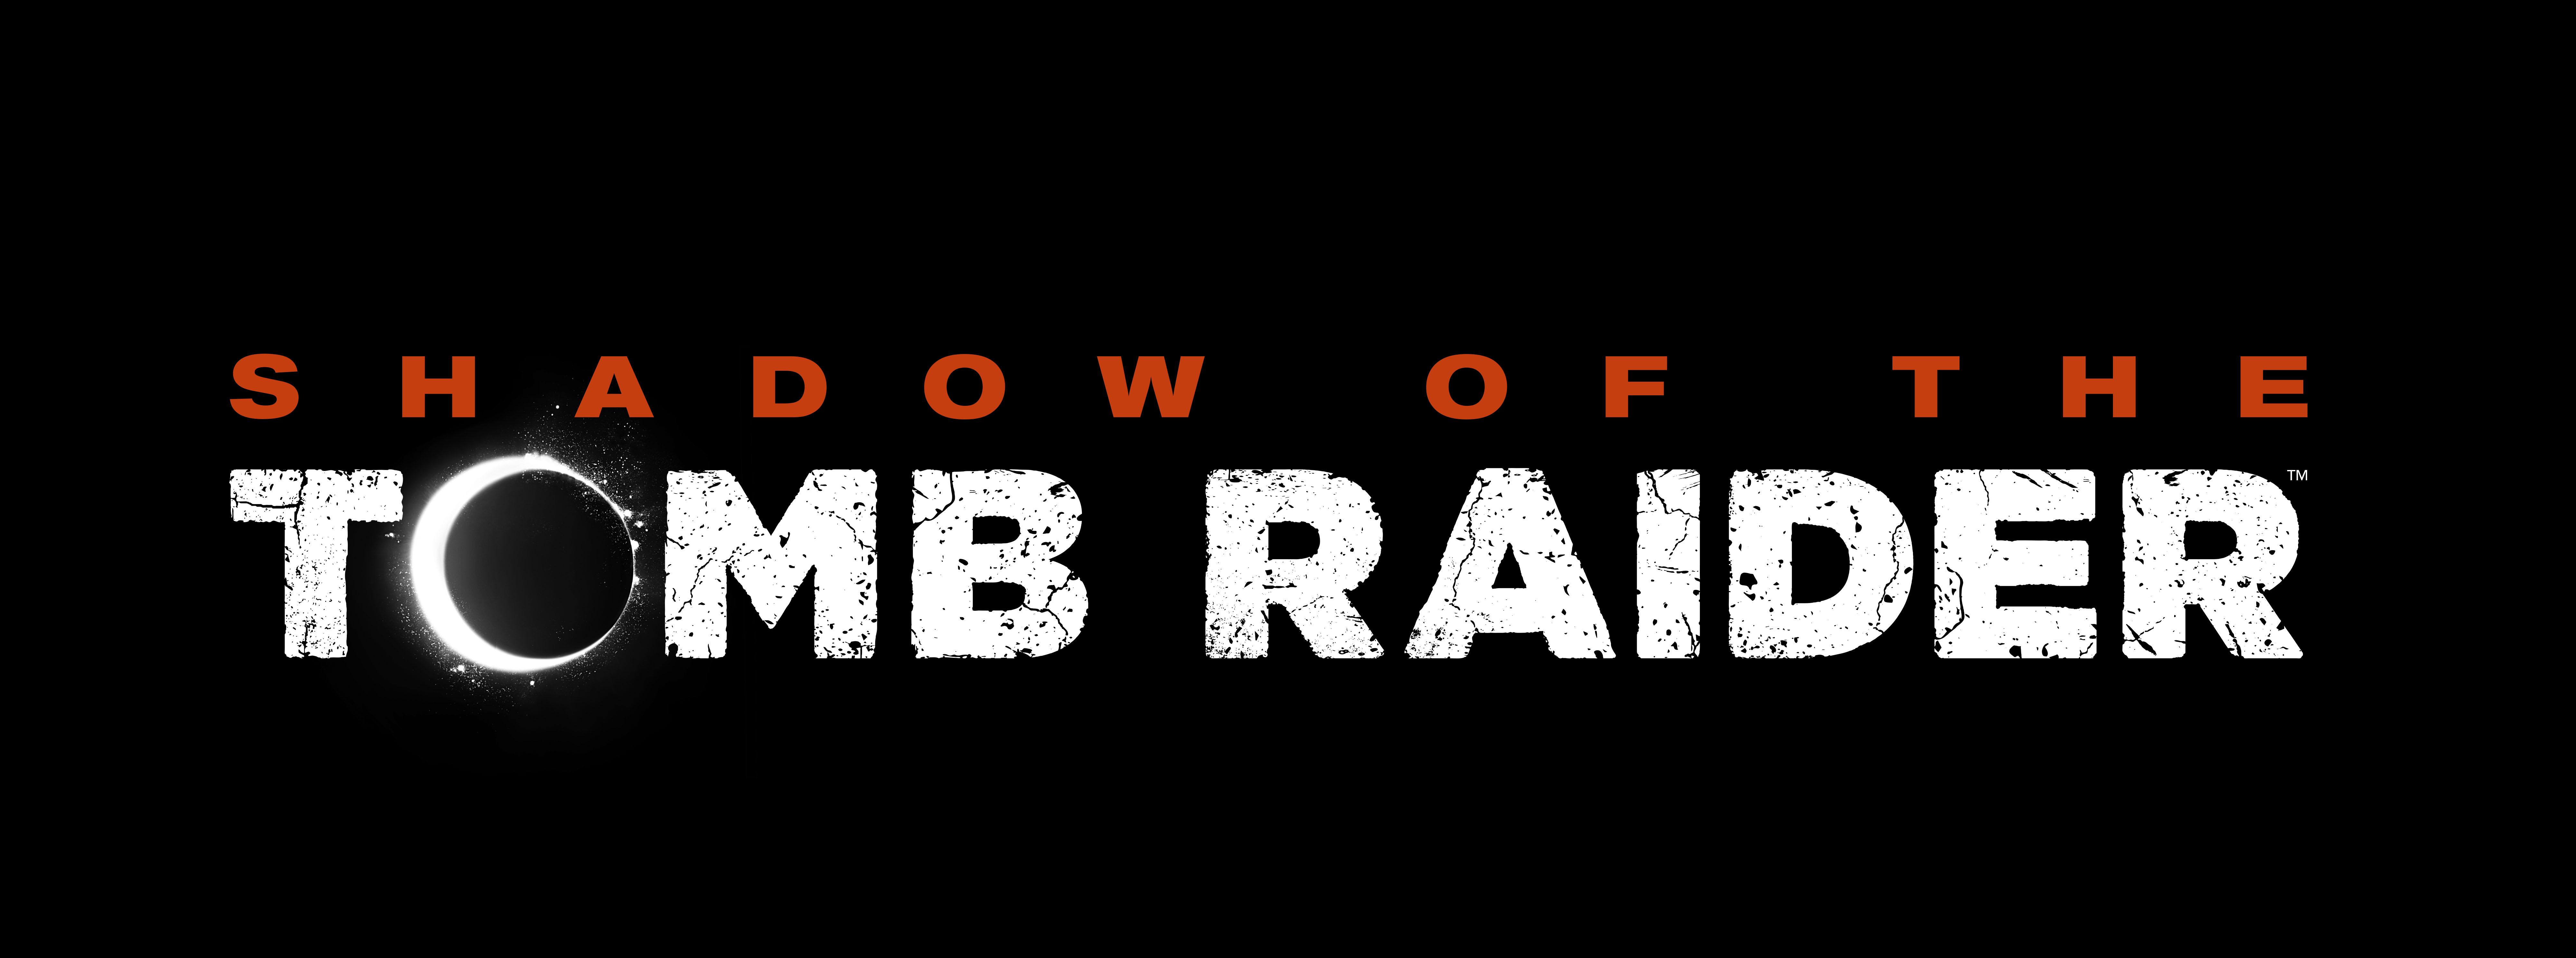 Shadow of the Tomb Raider - logo